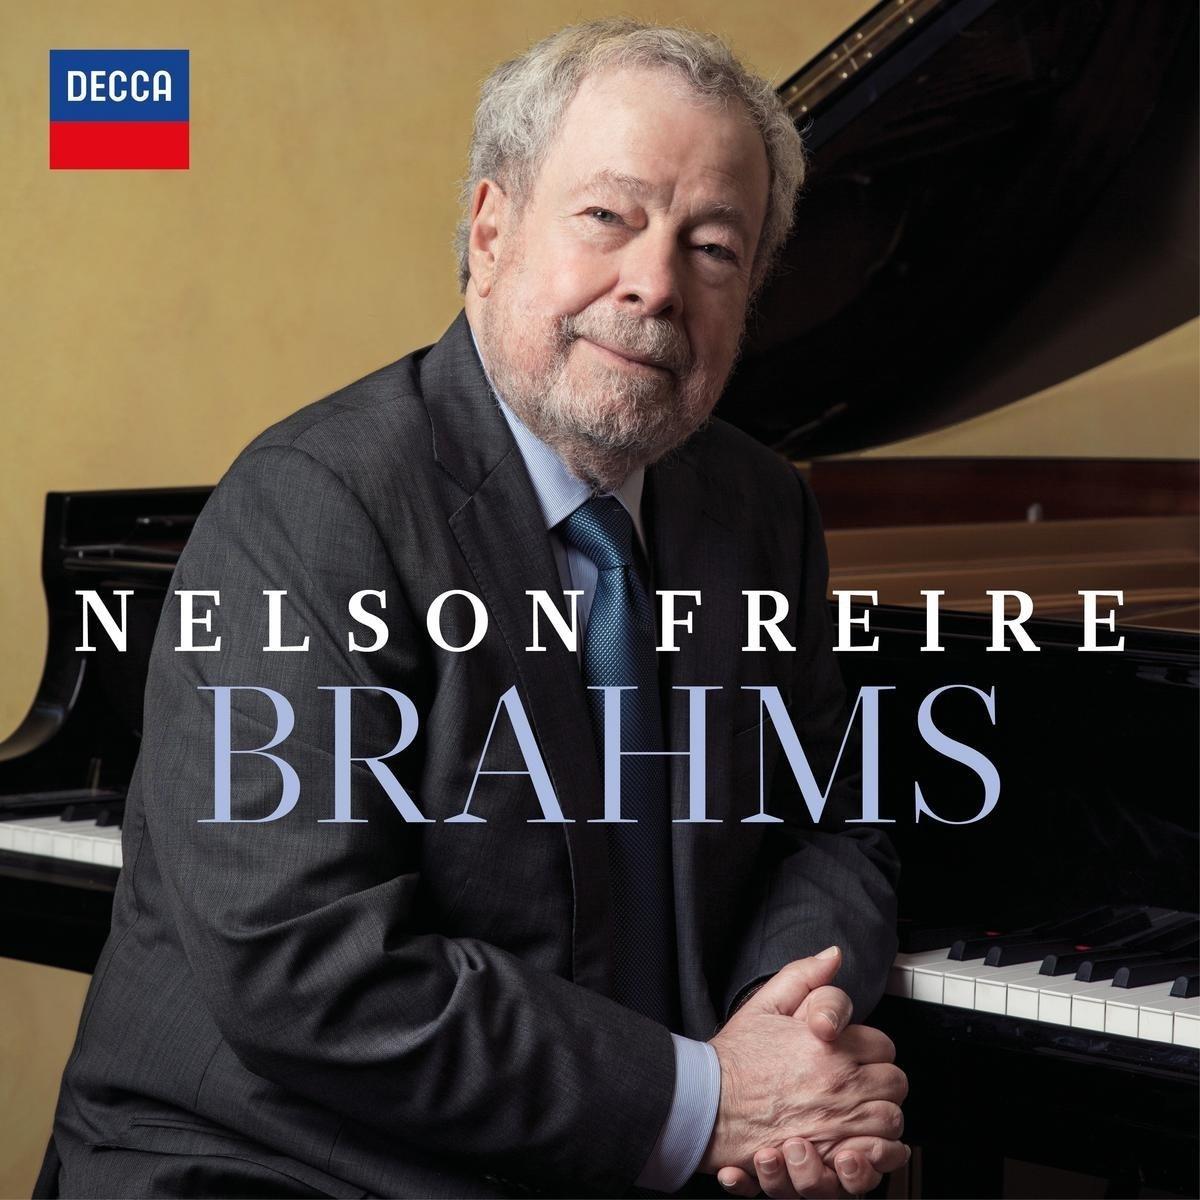 Nelson Freire Brahms Recital